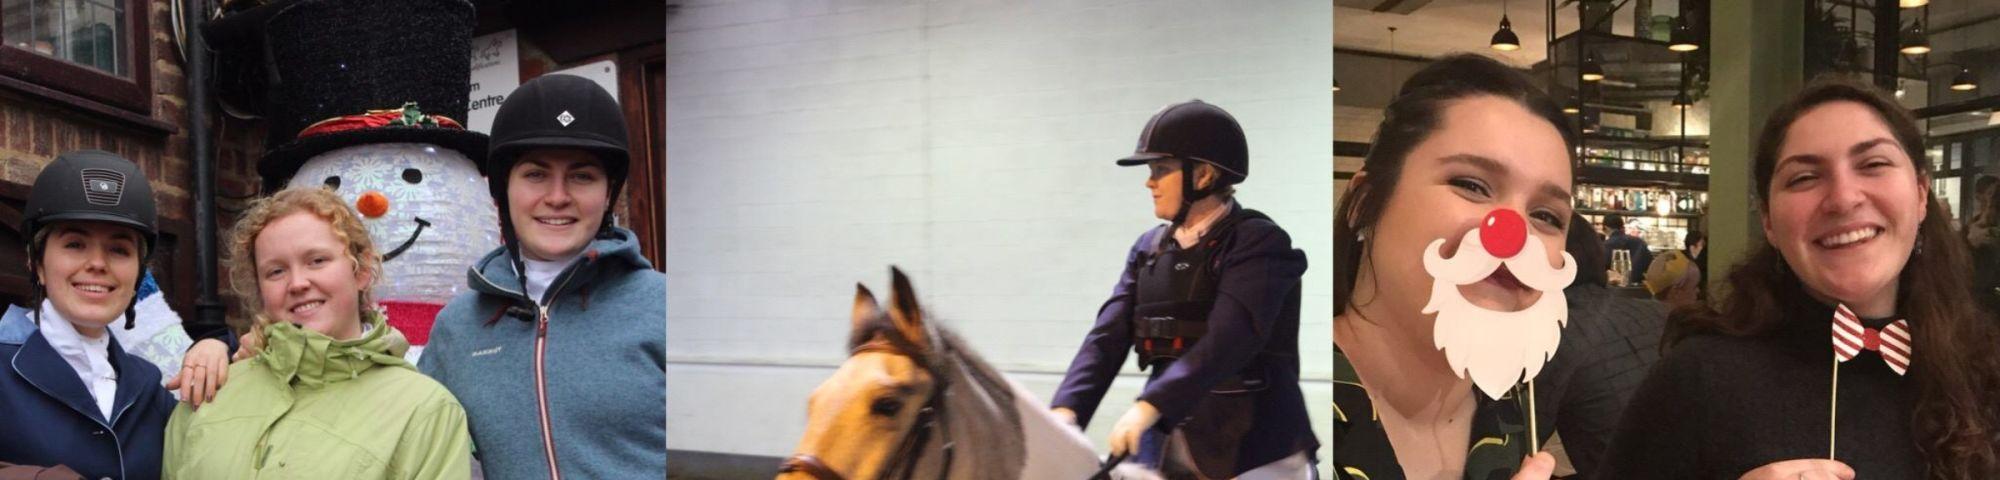 Equestrian club banner